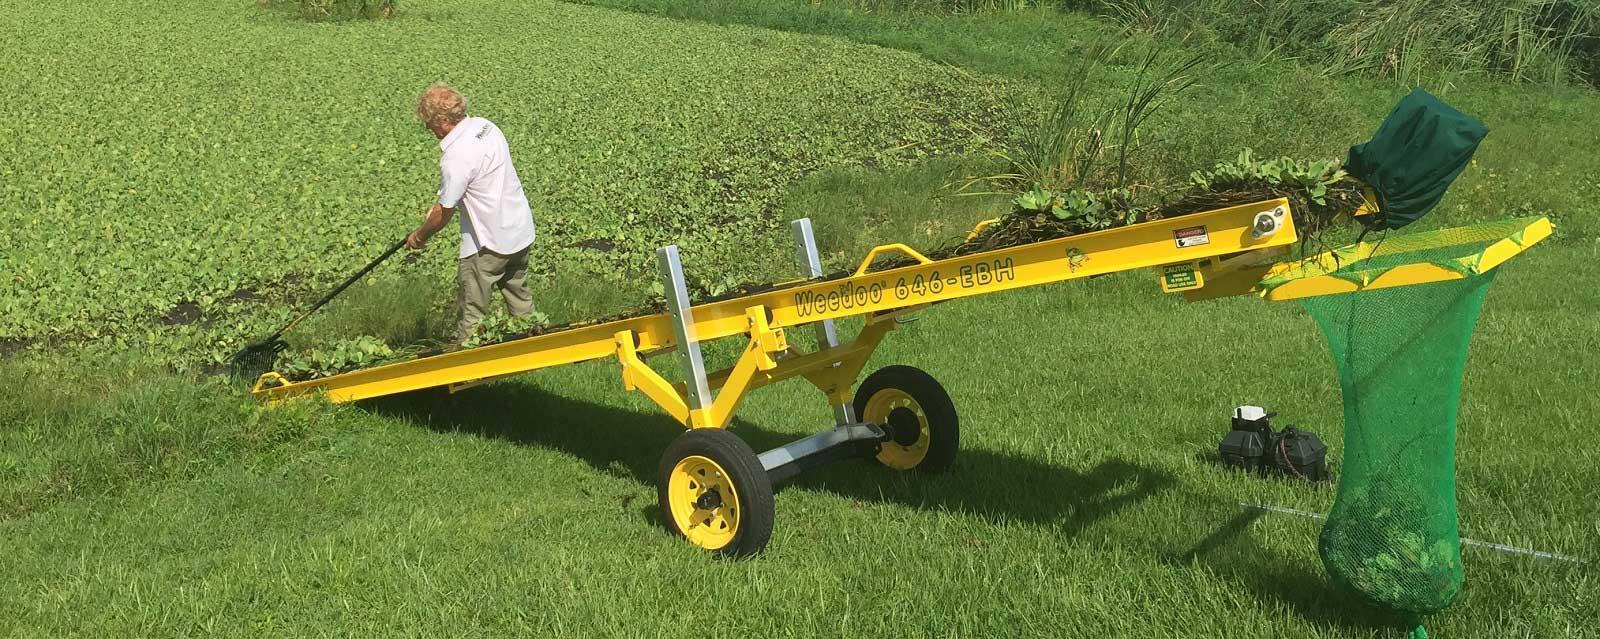 portable conveyor systems